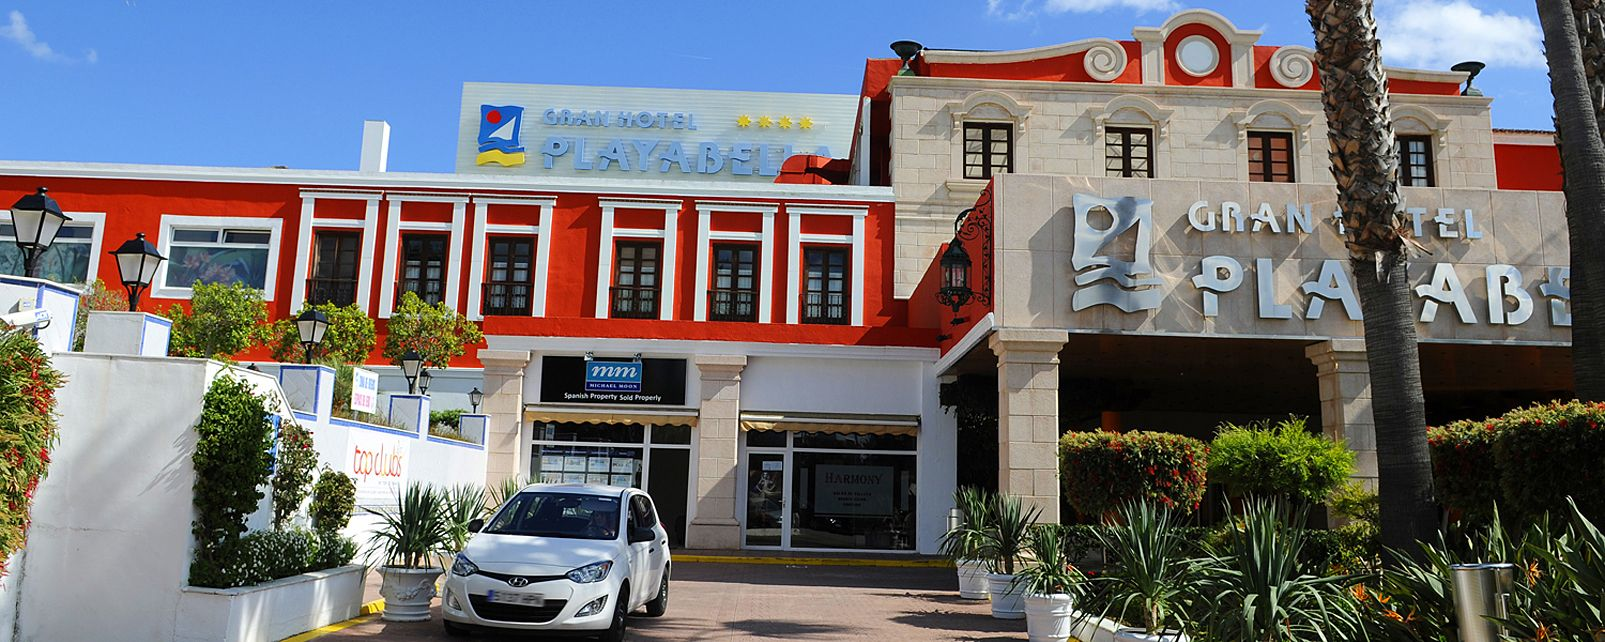 Hôtel Playabella Spa Gran Hotel